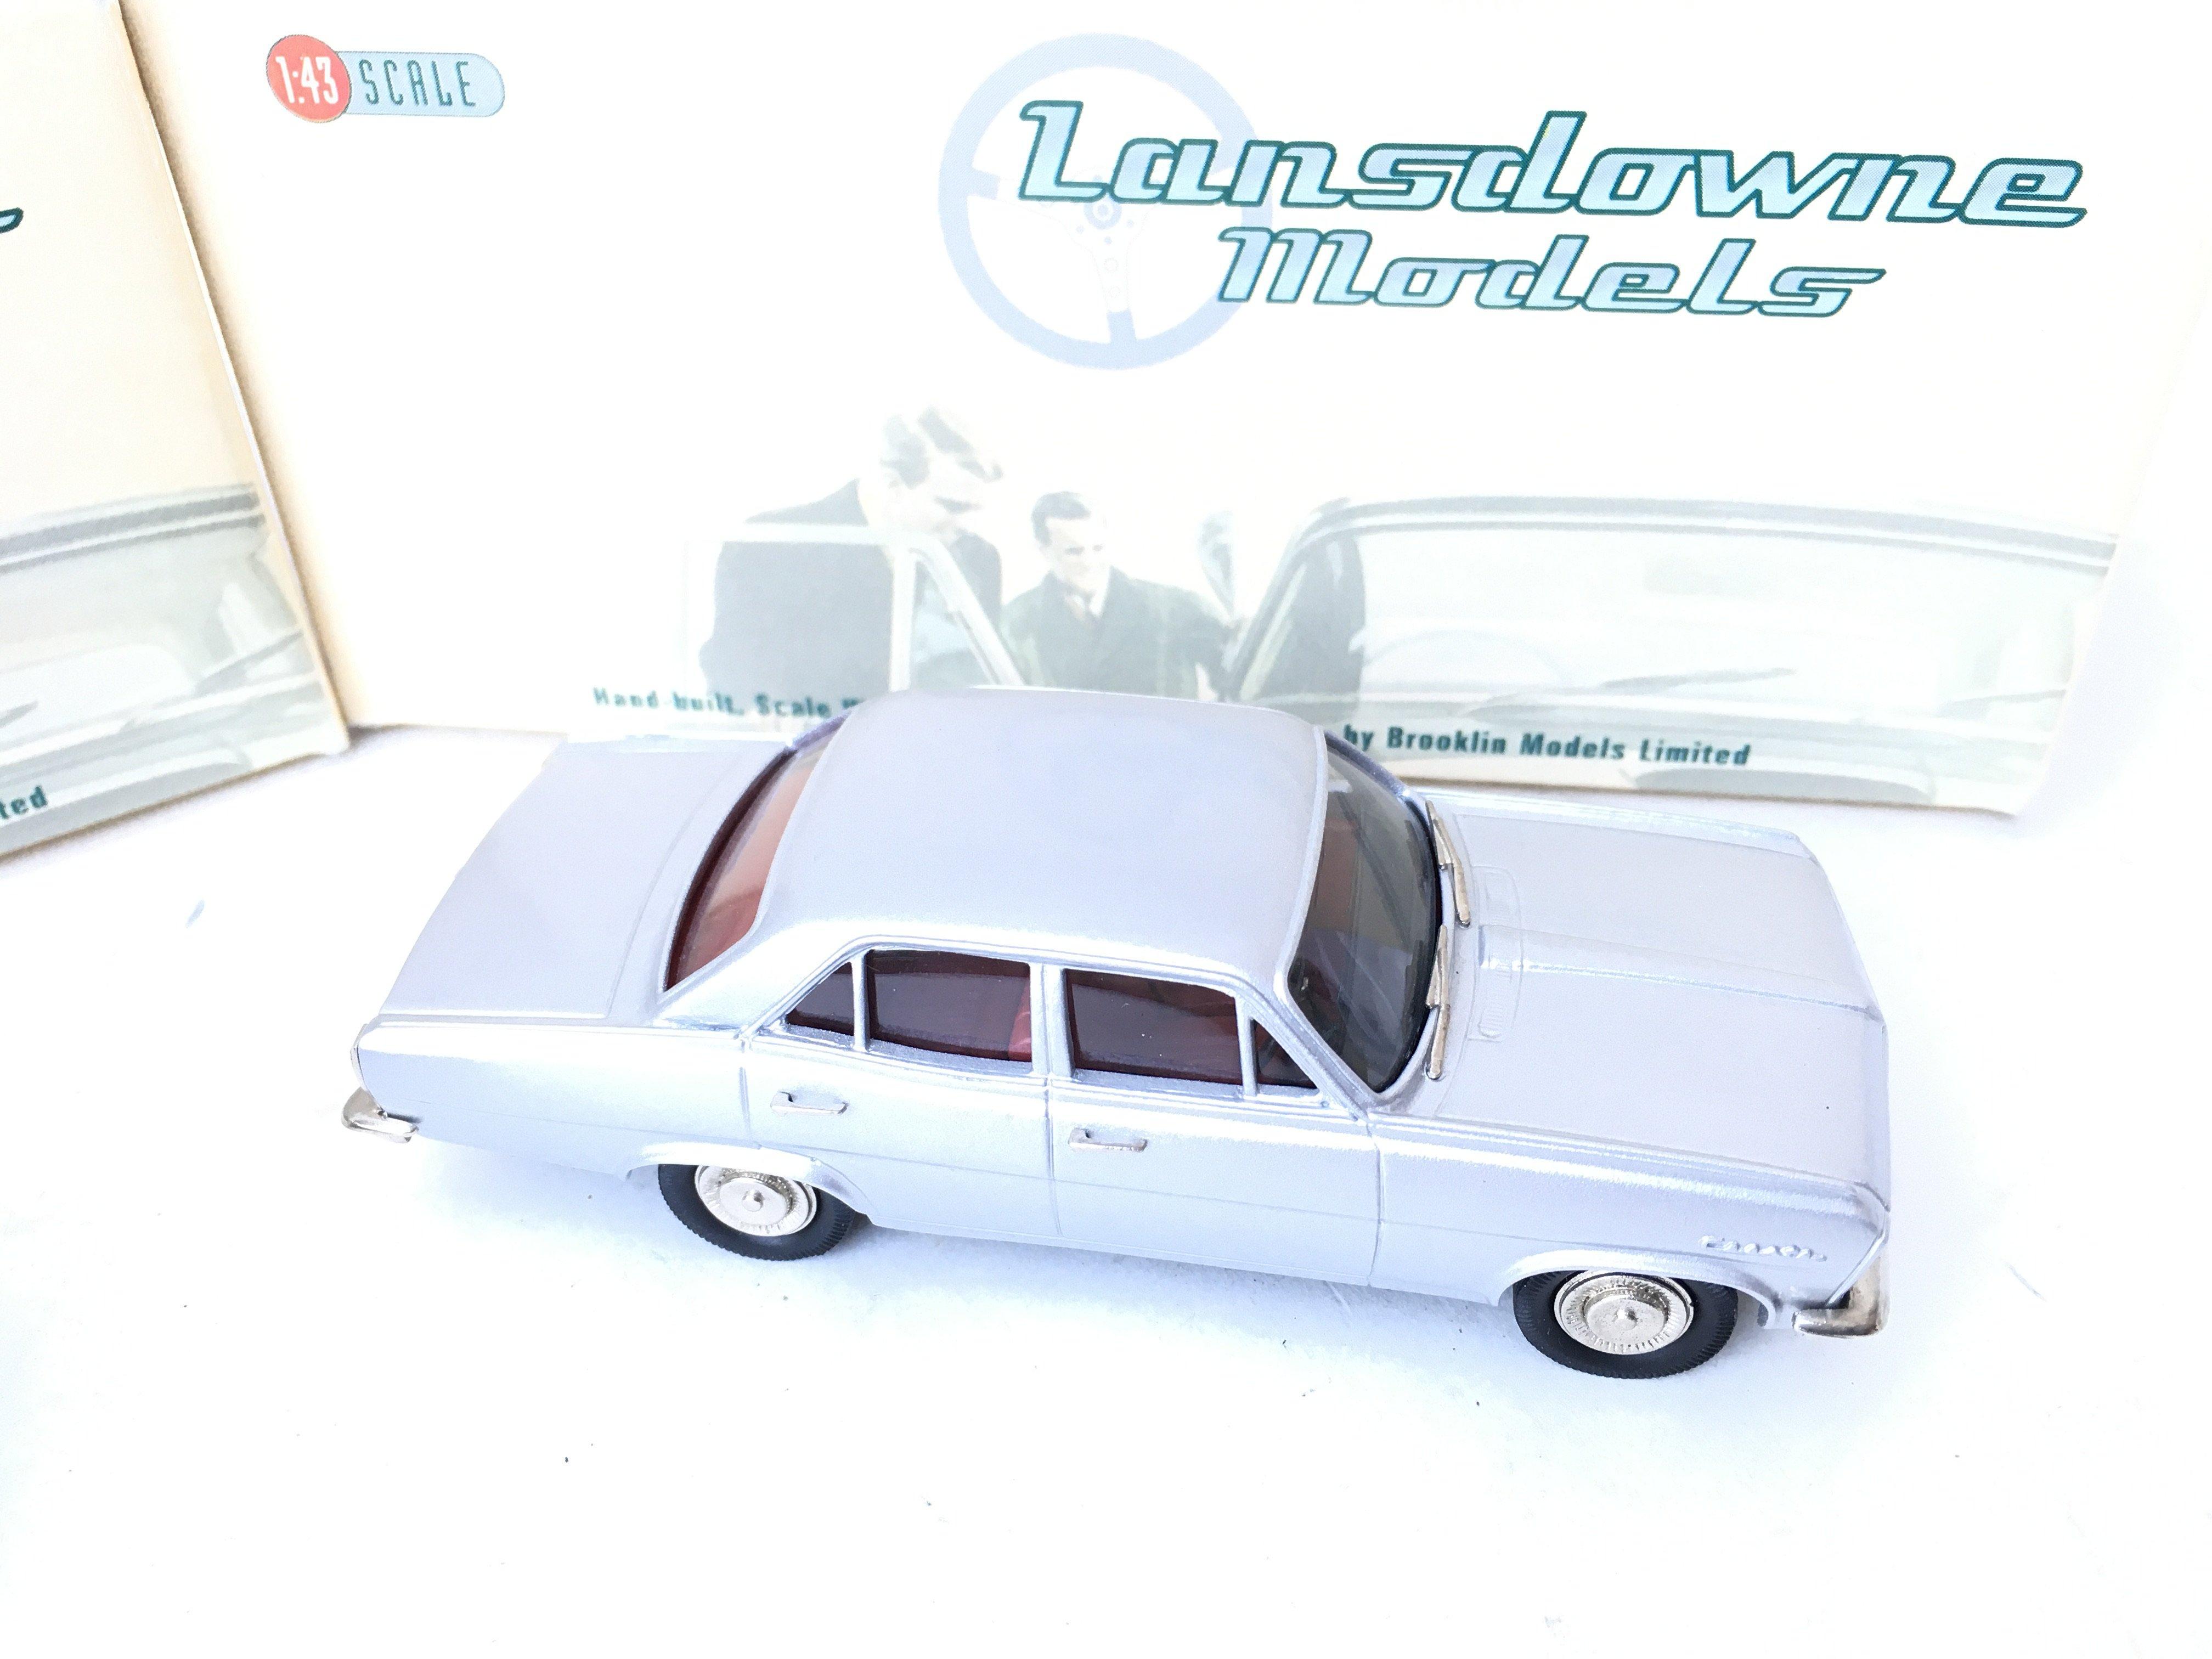 3 X Lansdowne Models including LDM 36 1952 Morris Minor Series II. LDM 37 1949 Triumph 2000 Roadster - Image 4 of 4